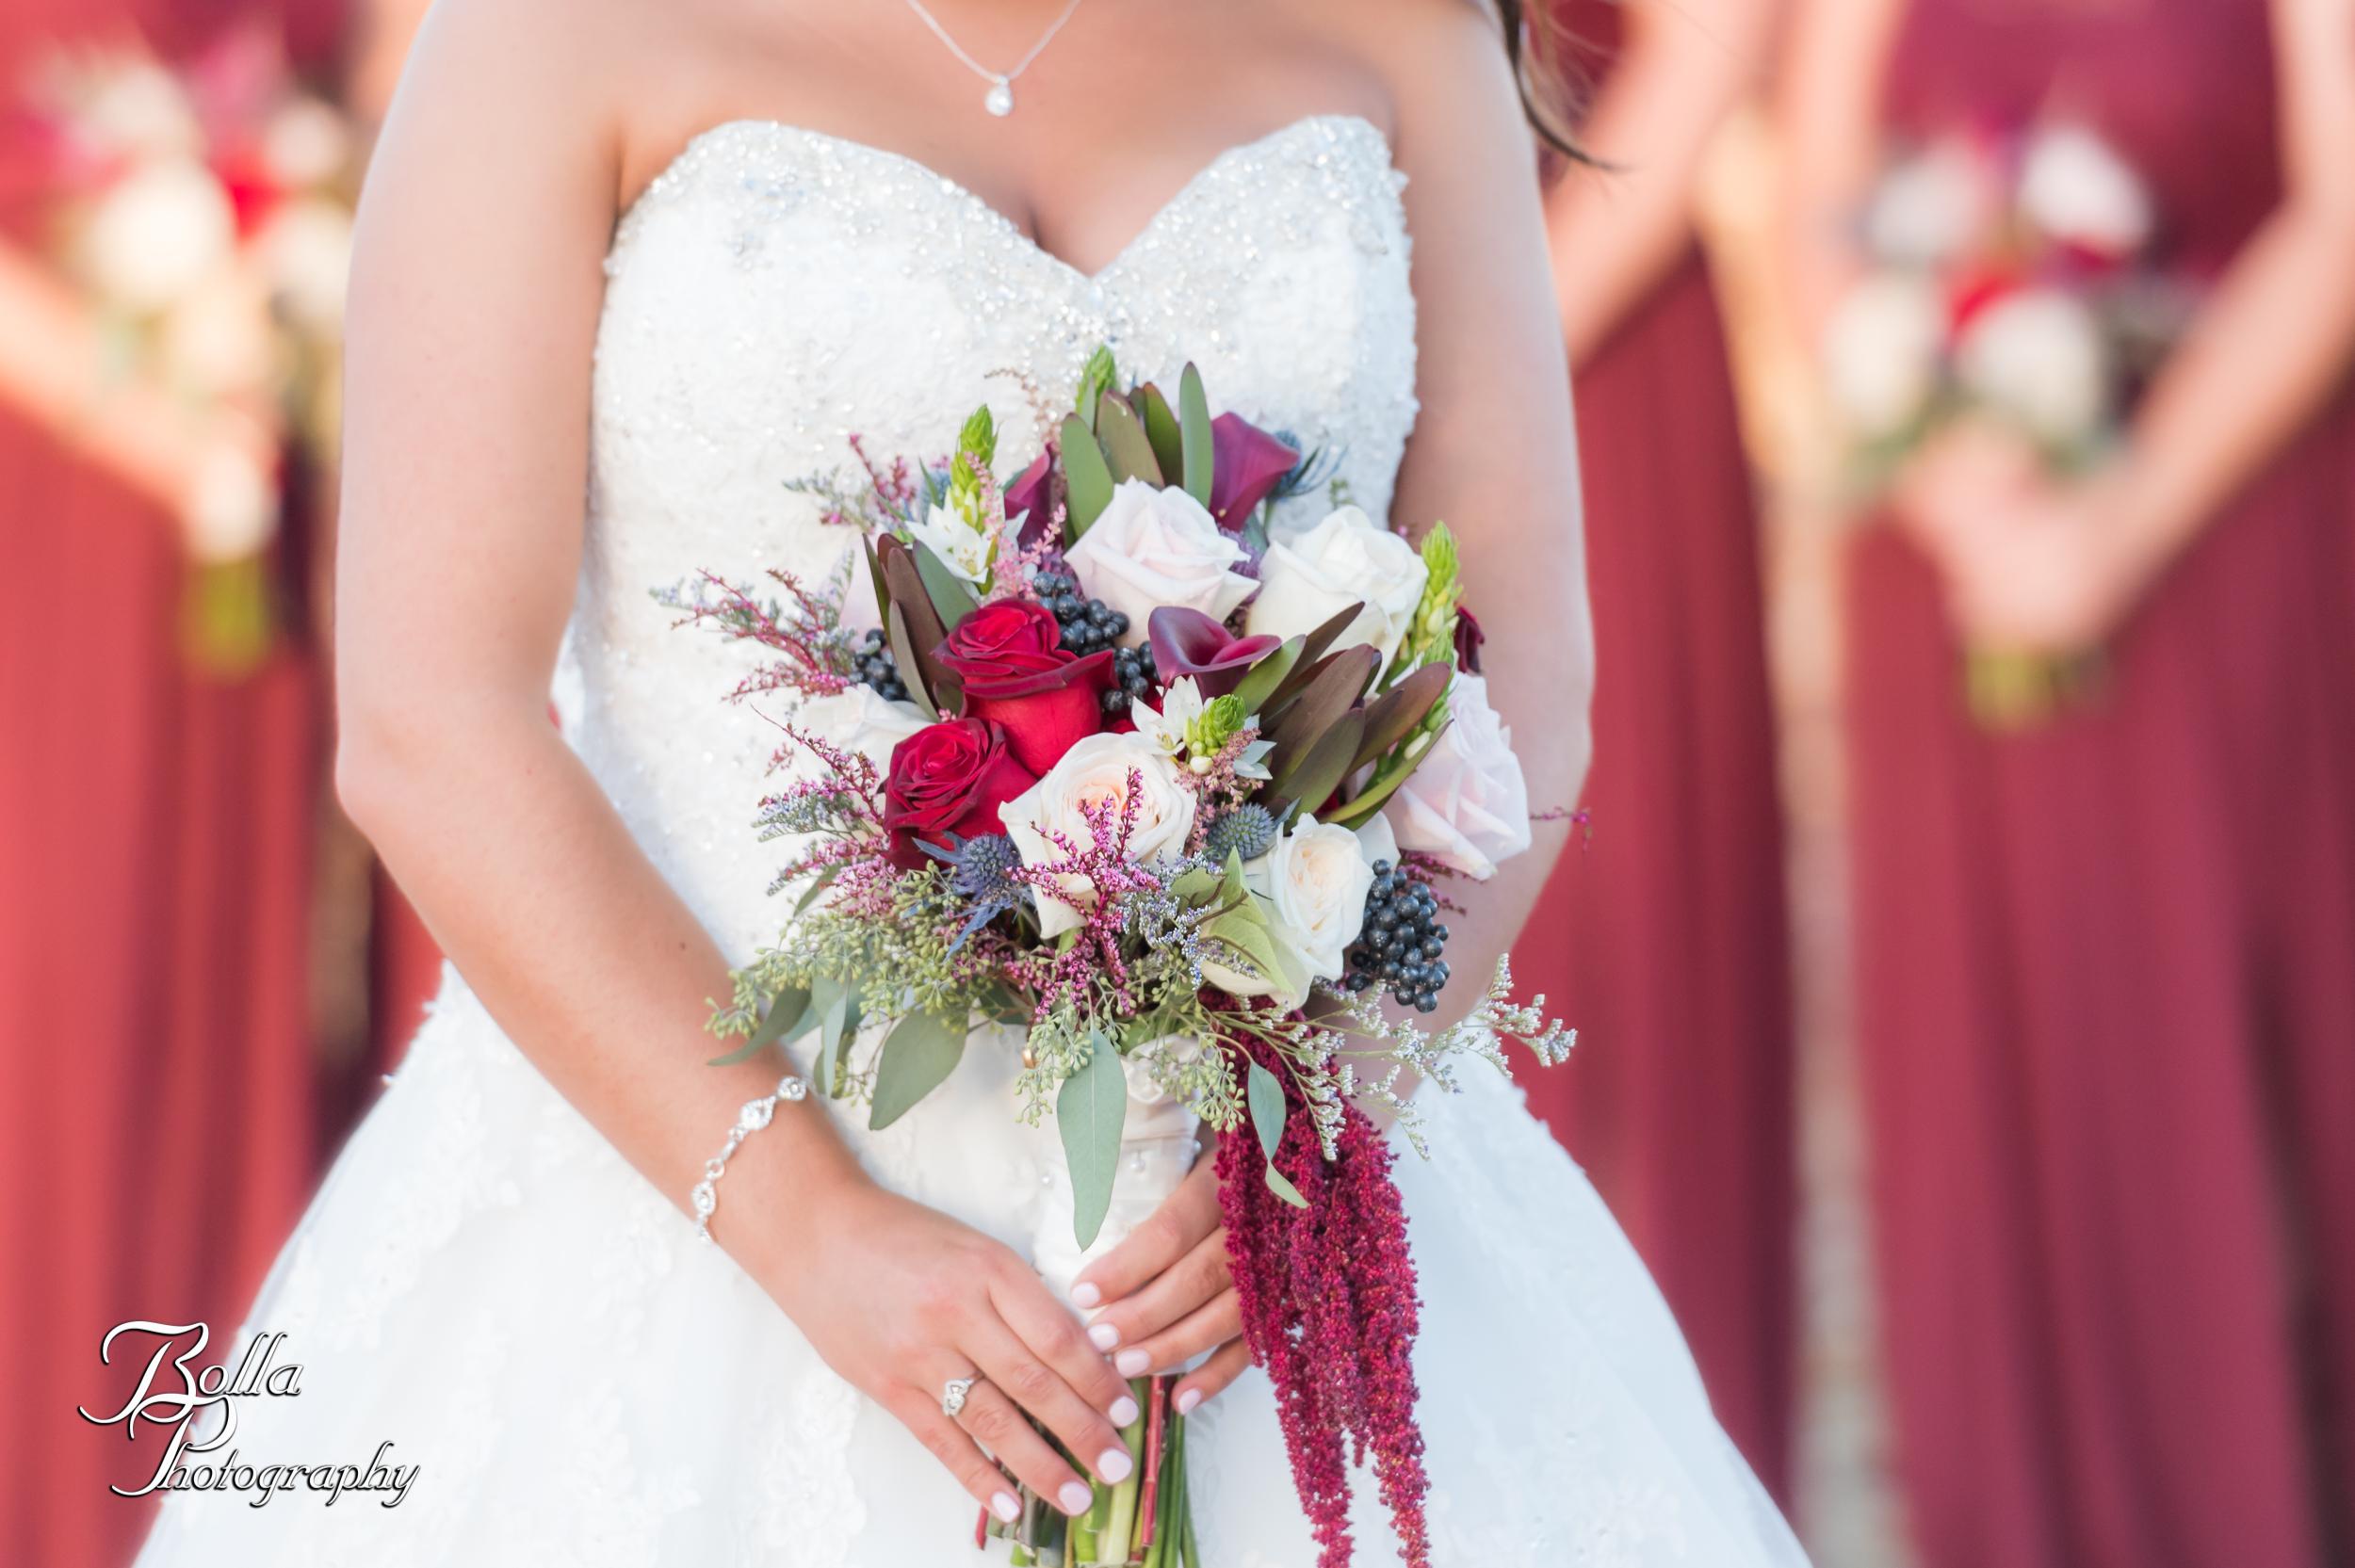 Bolla_photography_edwardsville_wedding_photographer_st_louis_weddings_Amber_Korsmeyer_Kyle_Gruner_Schwarz_Barn_blue_jeans_pickup_truck_autumn-0314.jpg